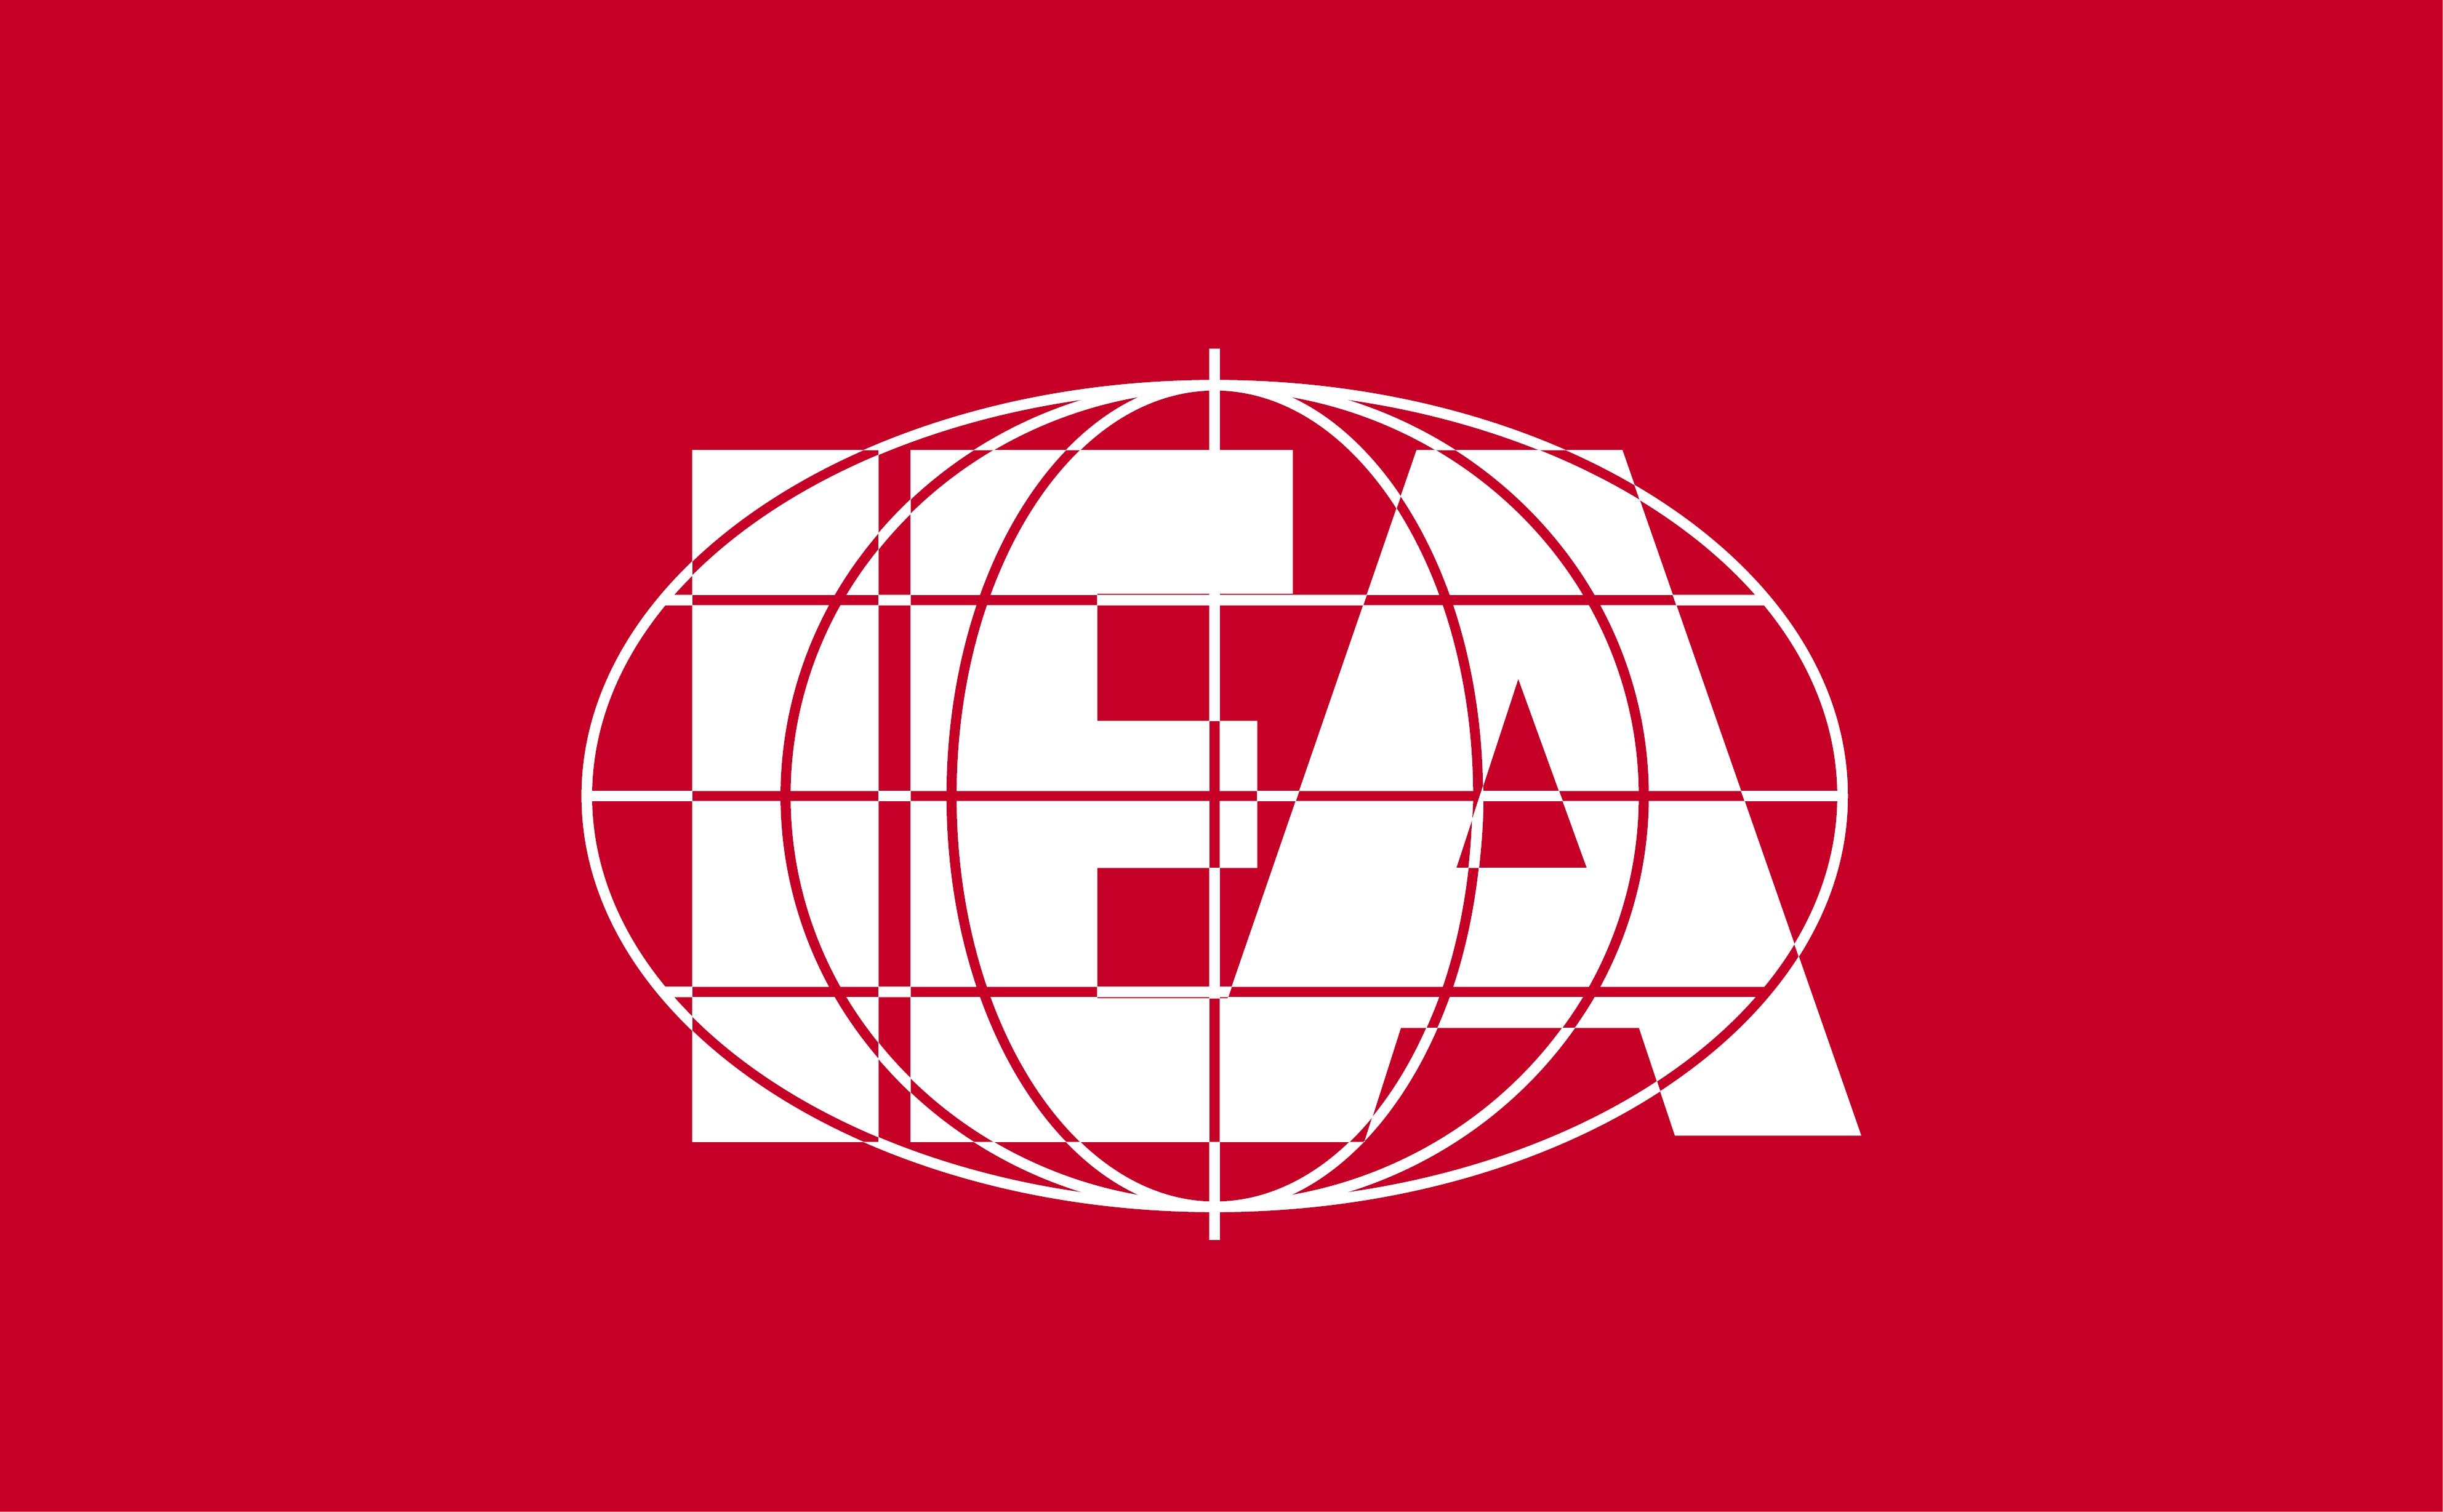 IEA_logo_red_background.jpg